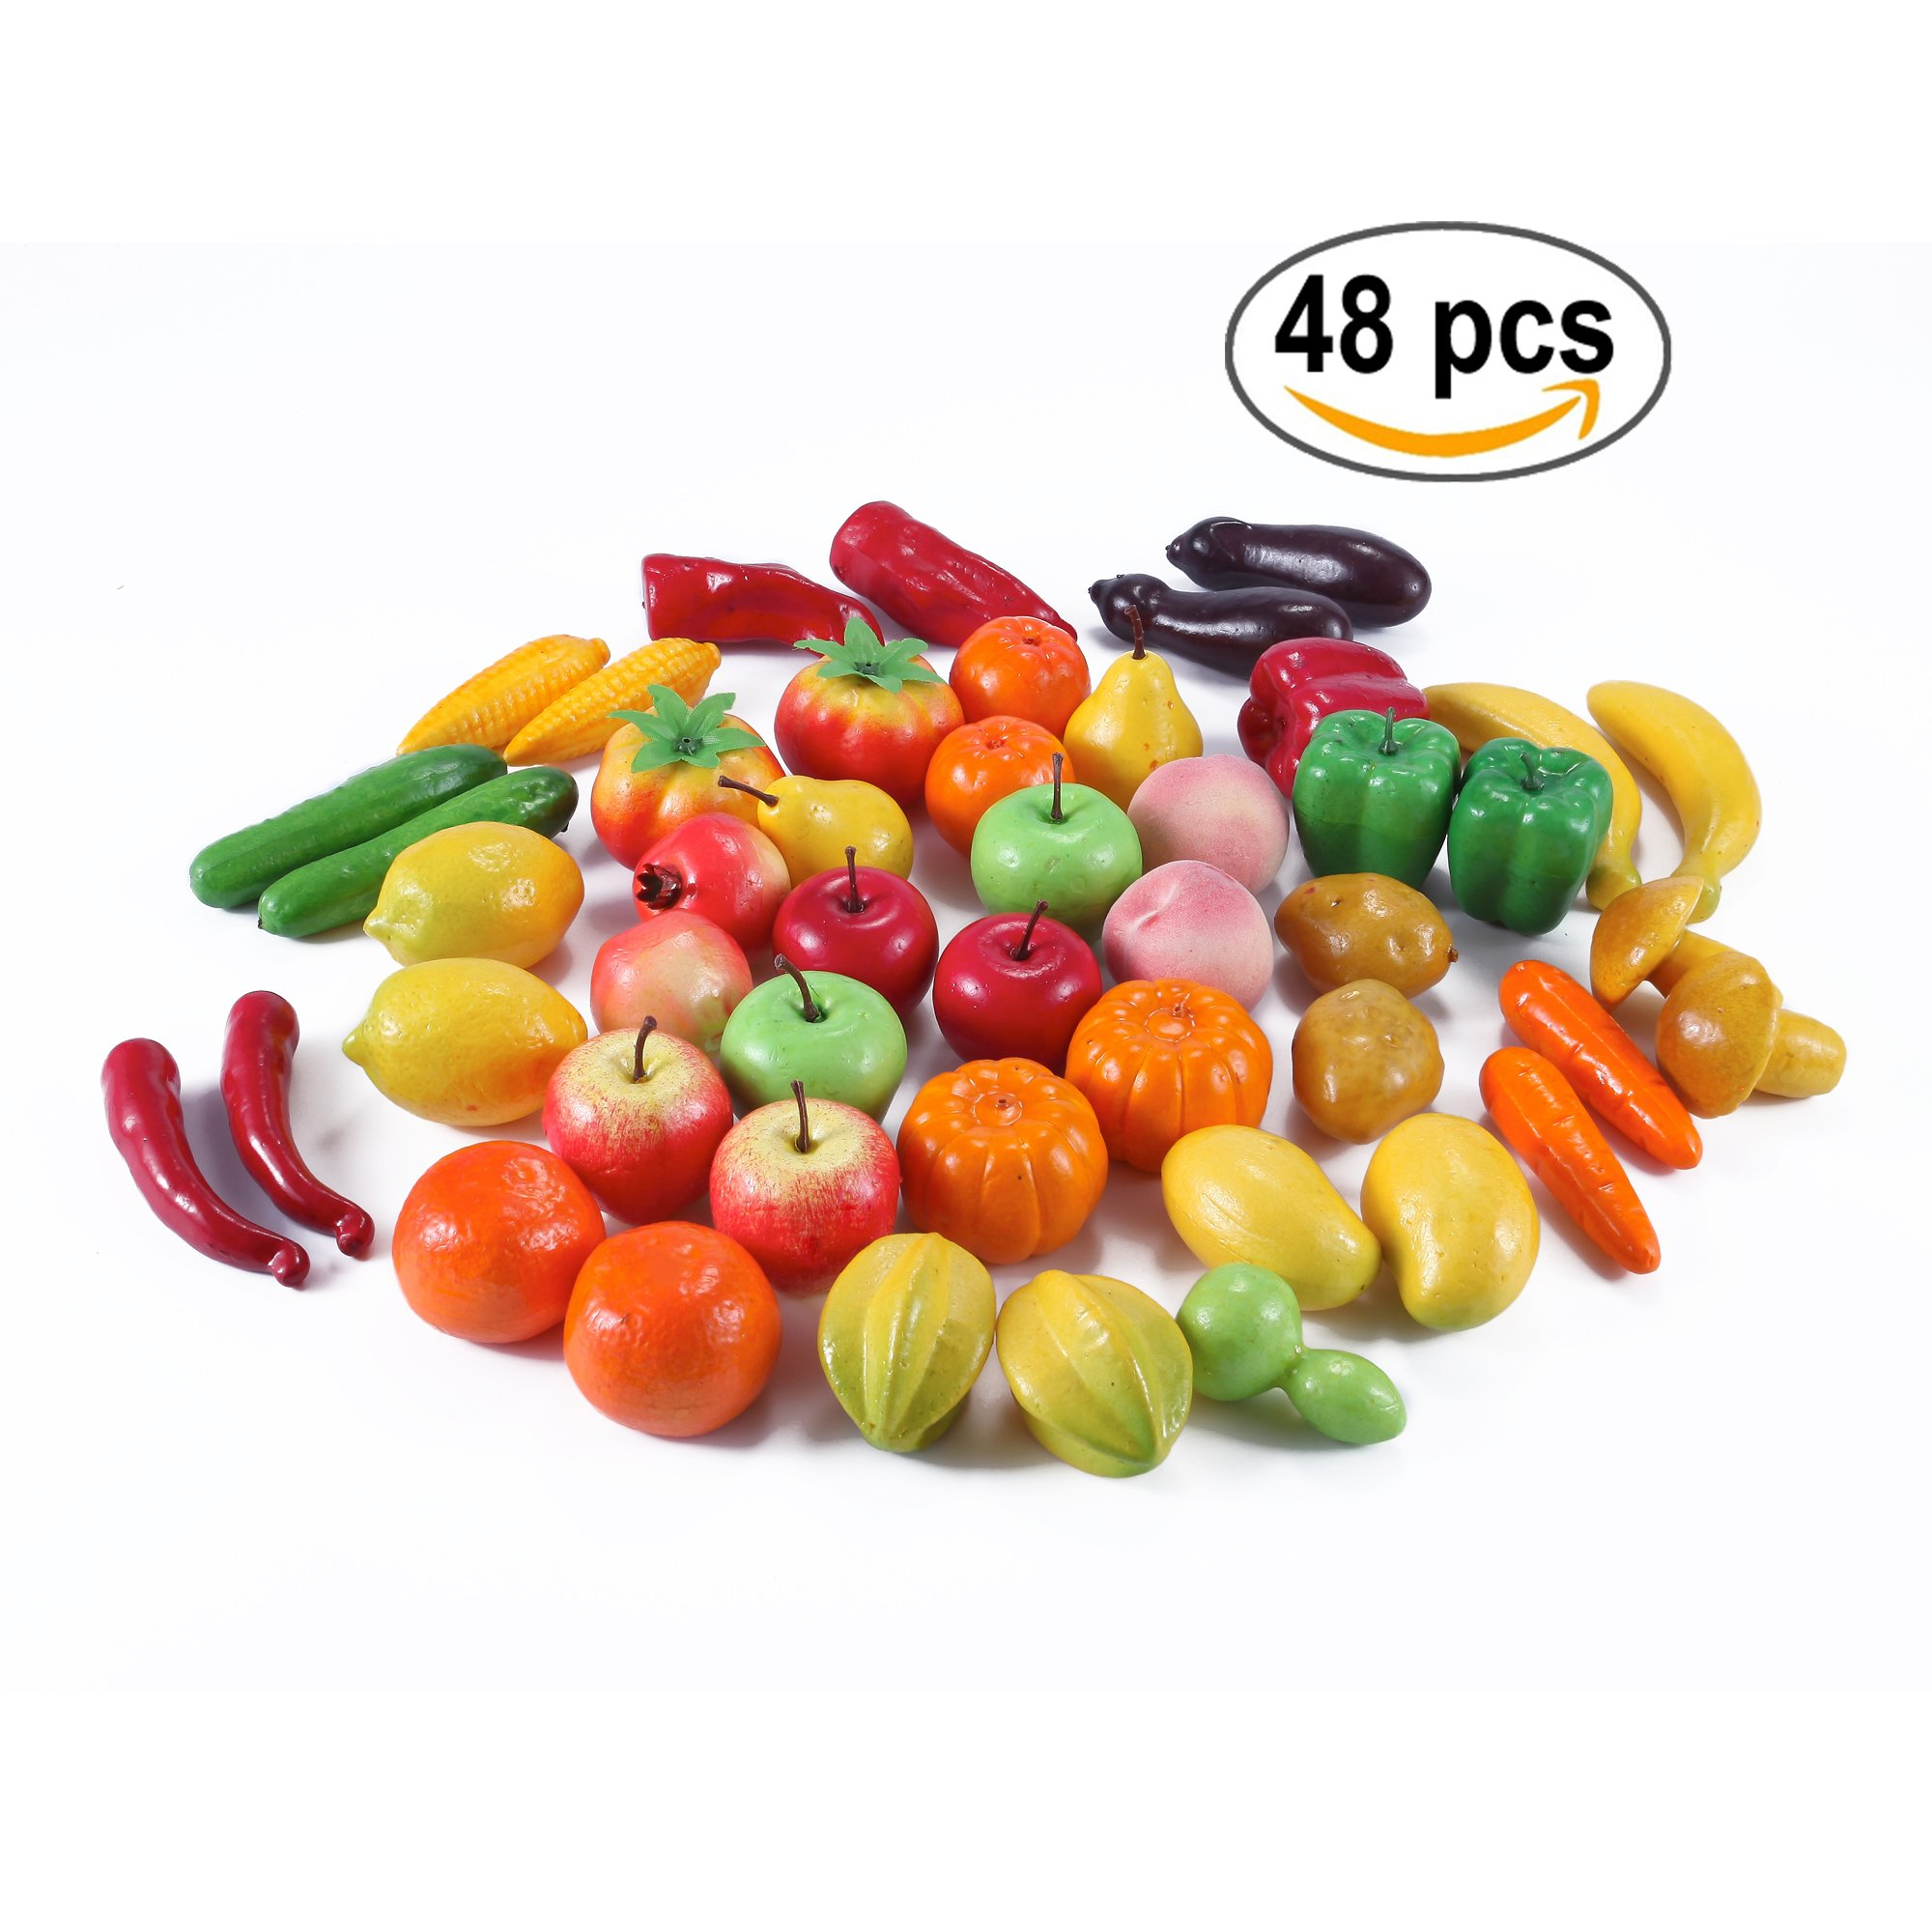 Lifelike Artificial Fruits (Assorted) 48pcs - Apple, Pumpkins, Mushrooms, Corns, Peppers, Peaches, Potatoes, Carrots, Potatoes and more!